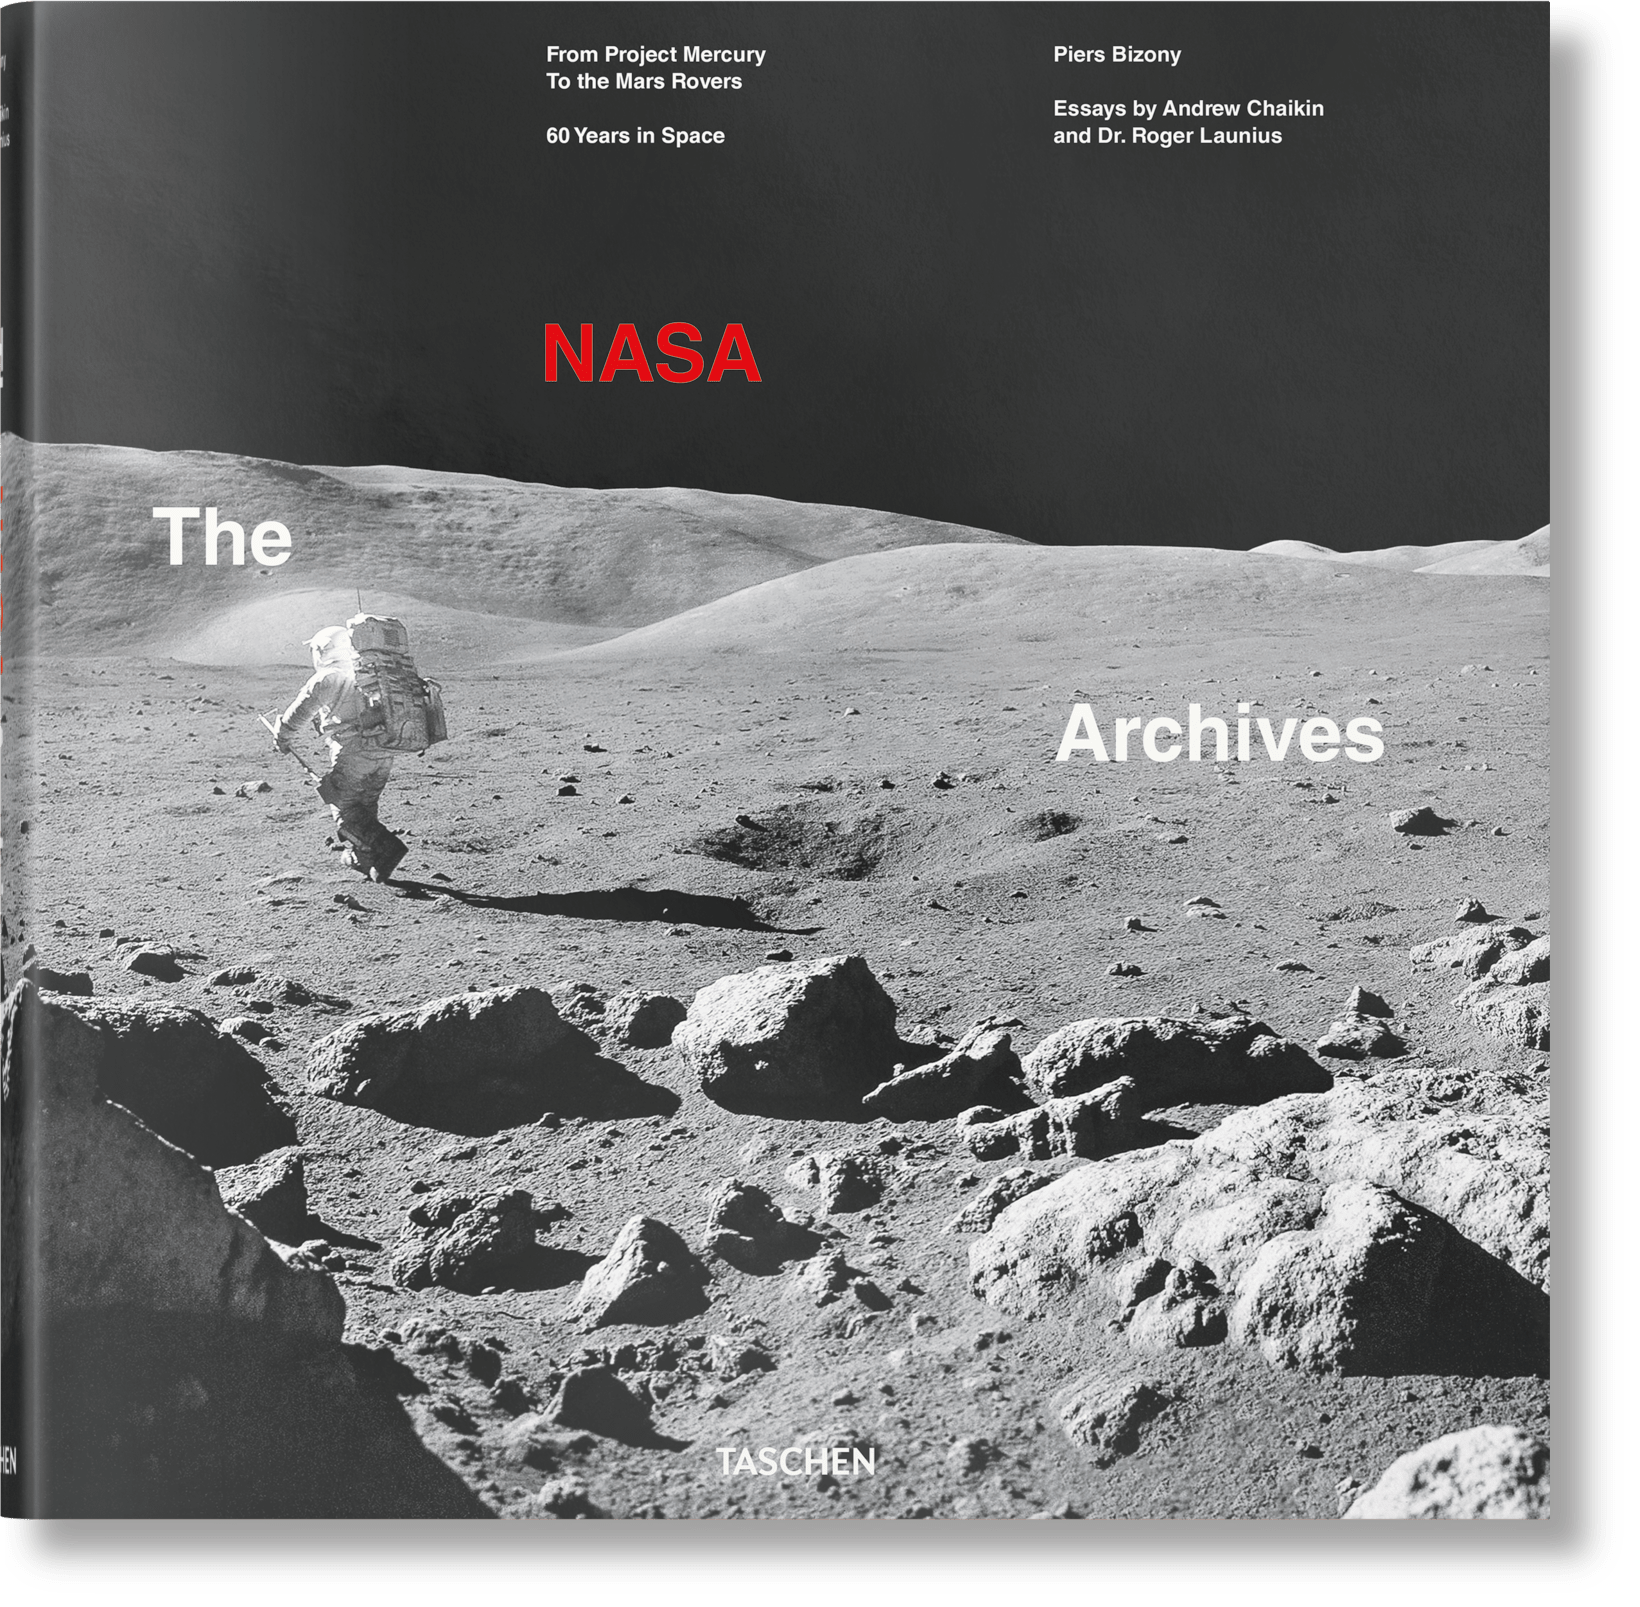 nasa-archives-taschen-1-img-min